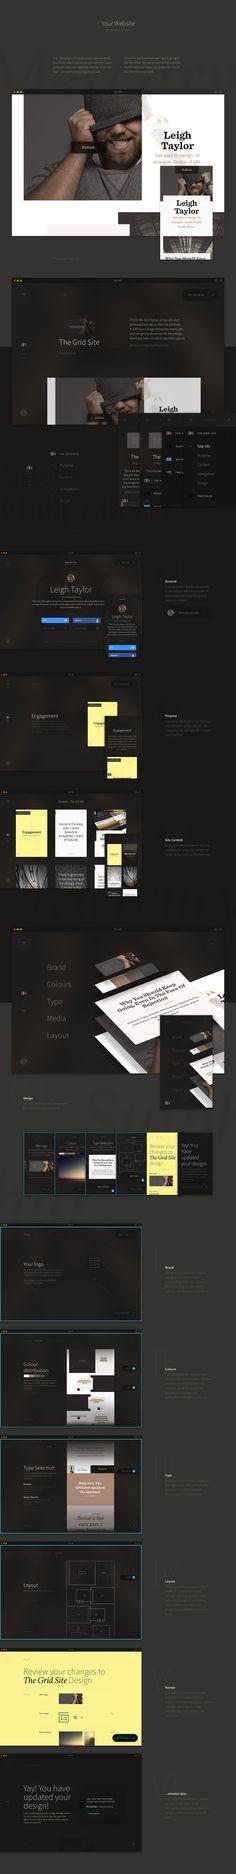 The Grid: Platform - UX/UI | Abduzeedo Design Inspiration